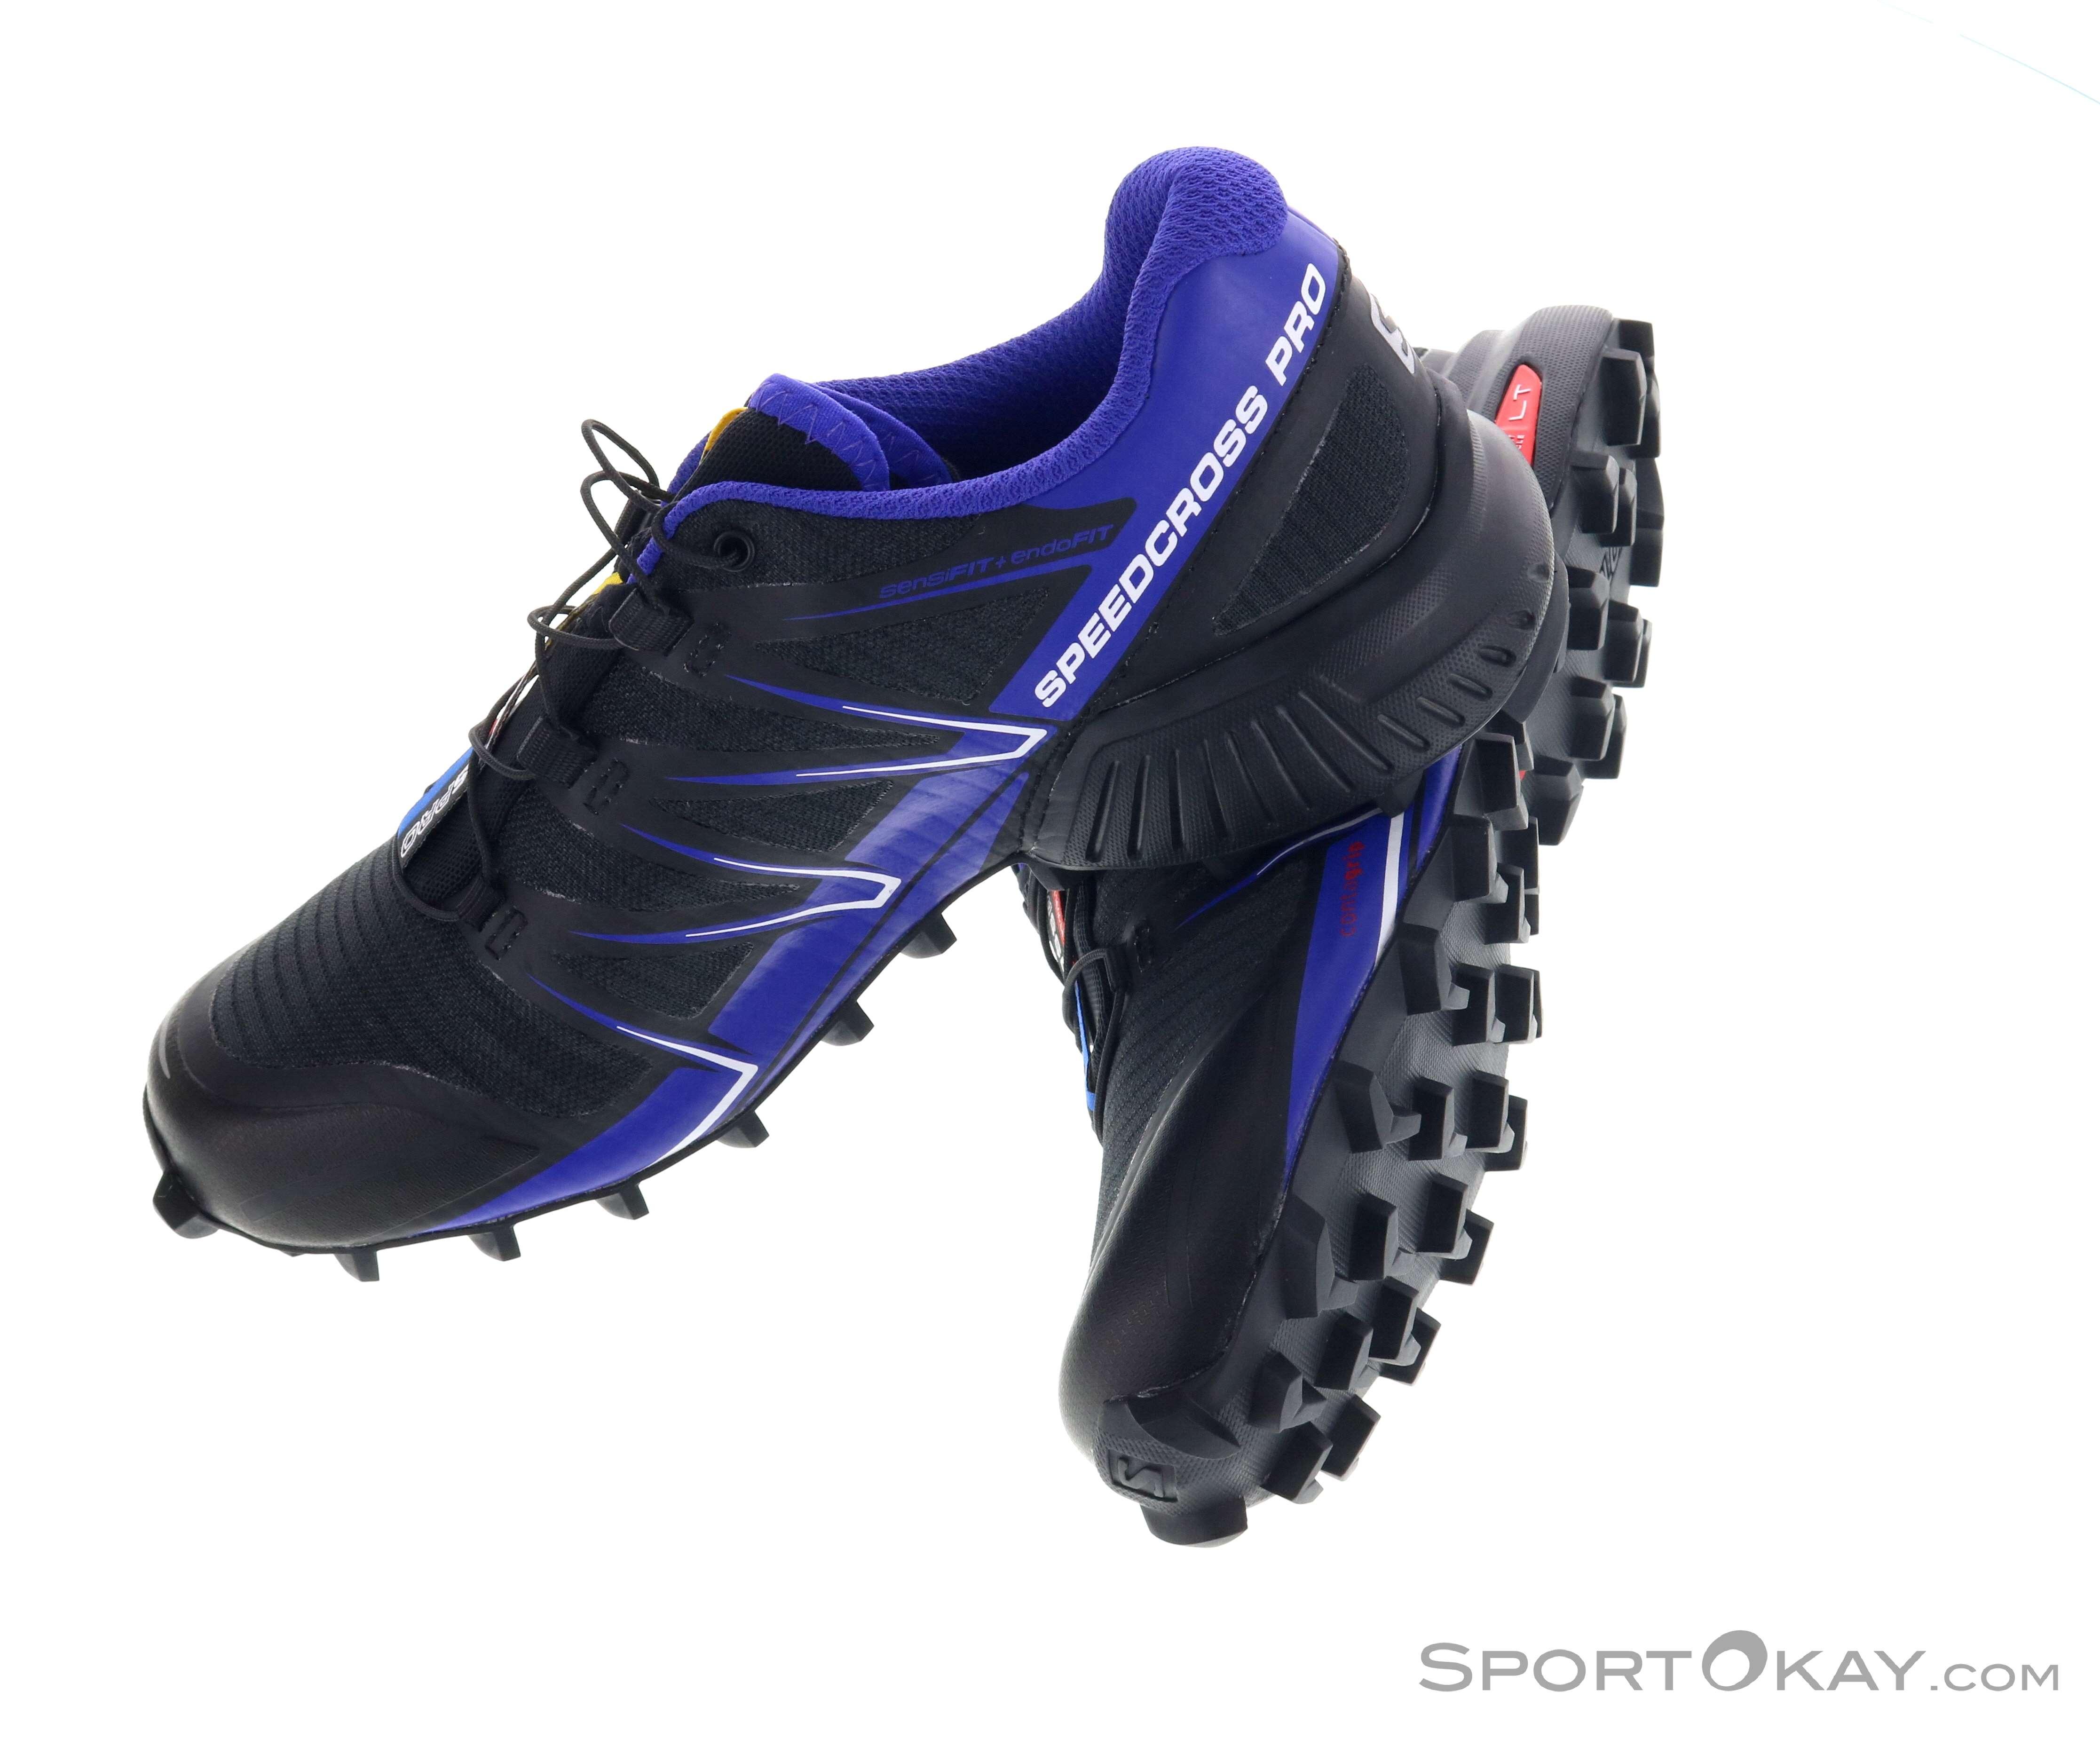 meilleures baskets 9acbc 81066 Salomon Salomon Speedcross 3 Pro Womens Trail Running Shoes